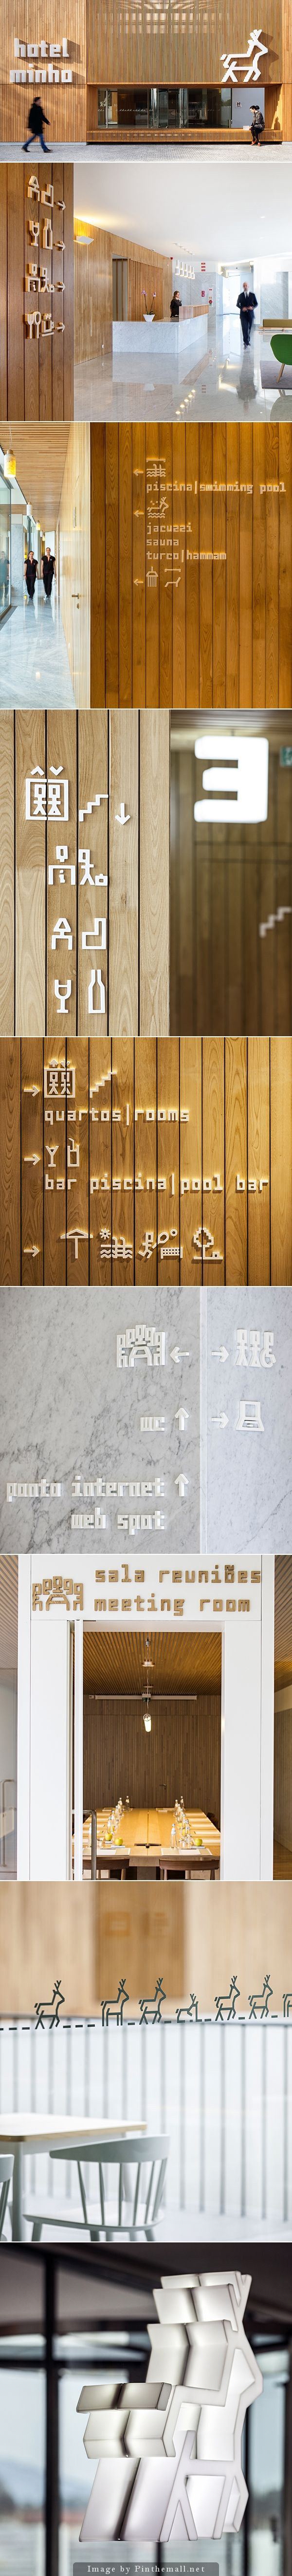 Hotel Minho, Environmental Graphic Design, Signage Sistems, Interior wayfinding…